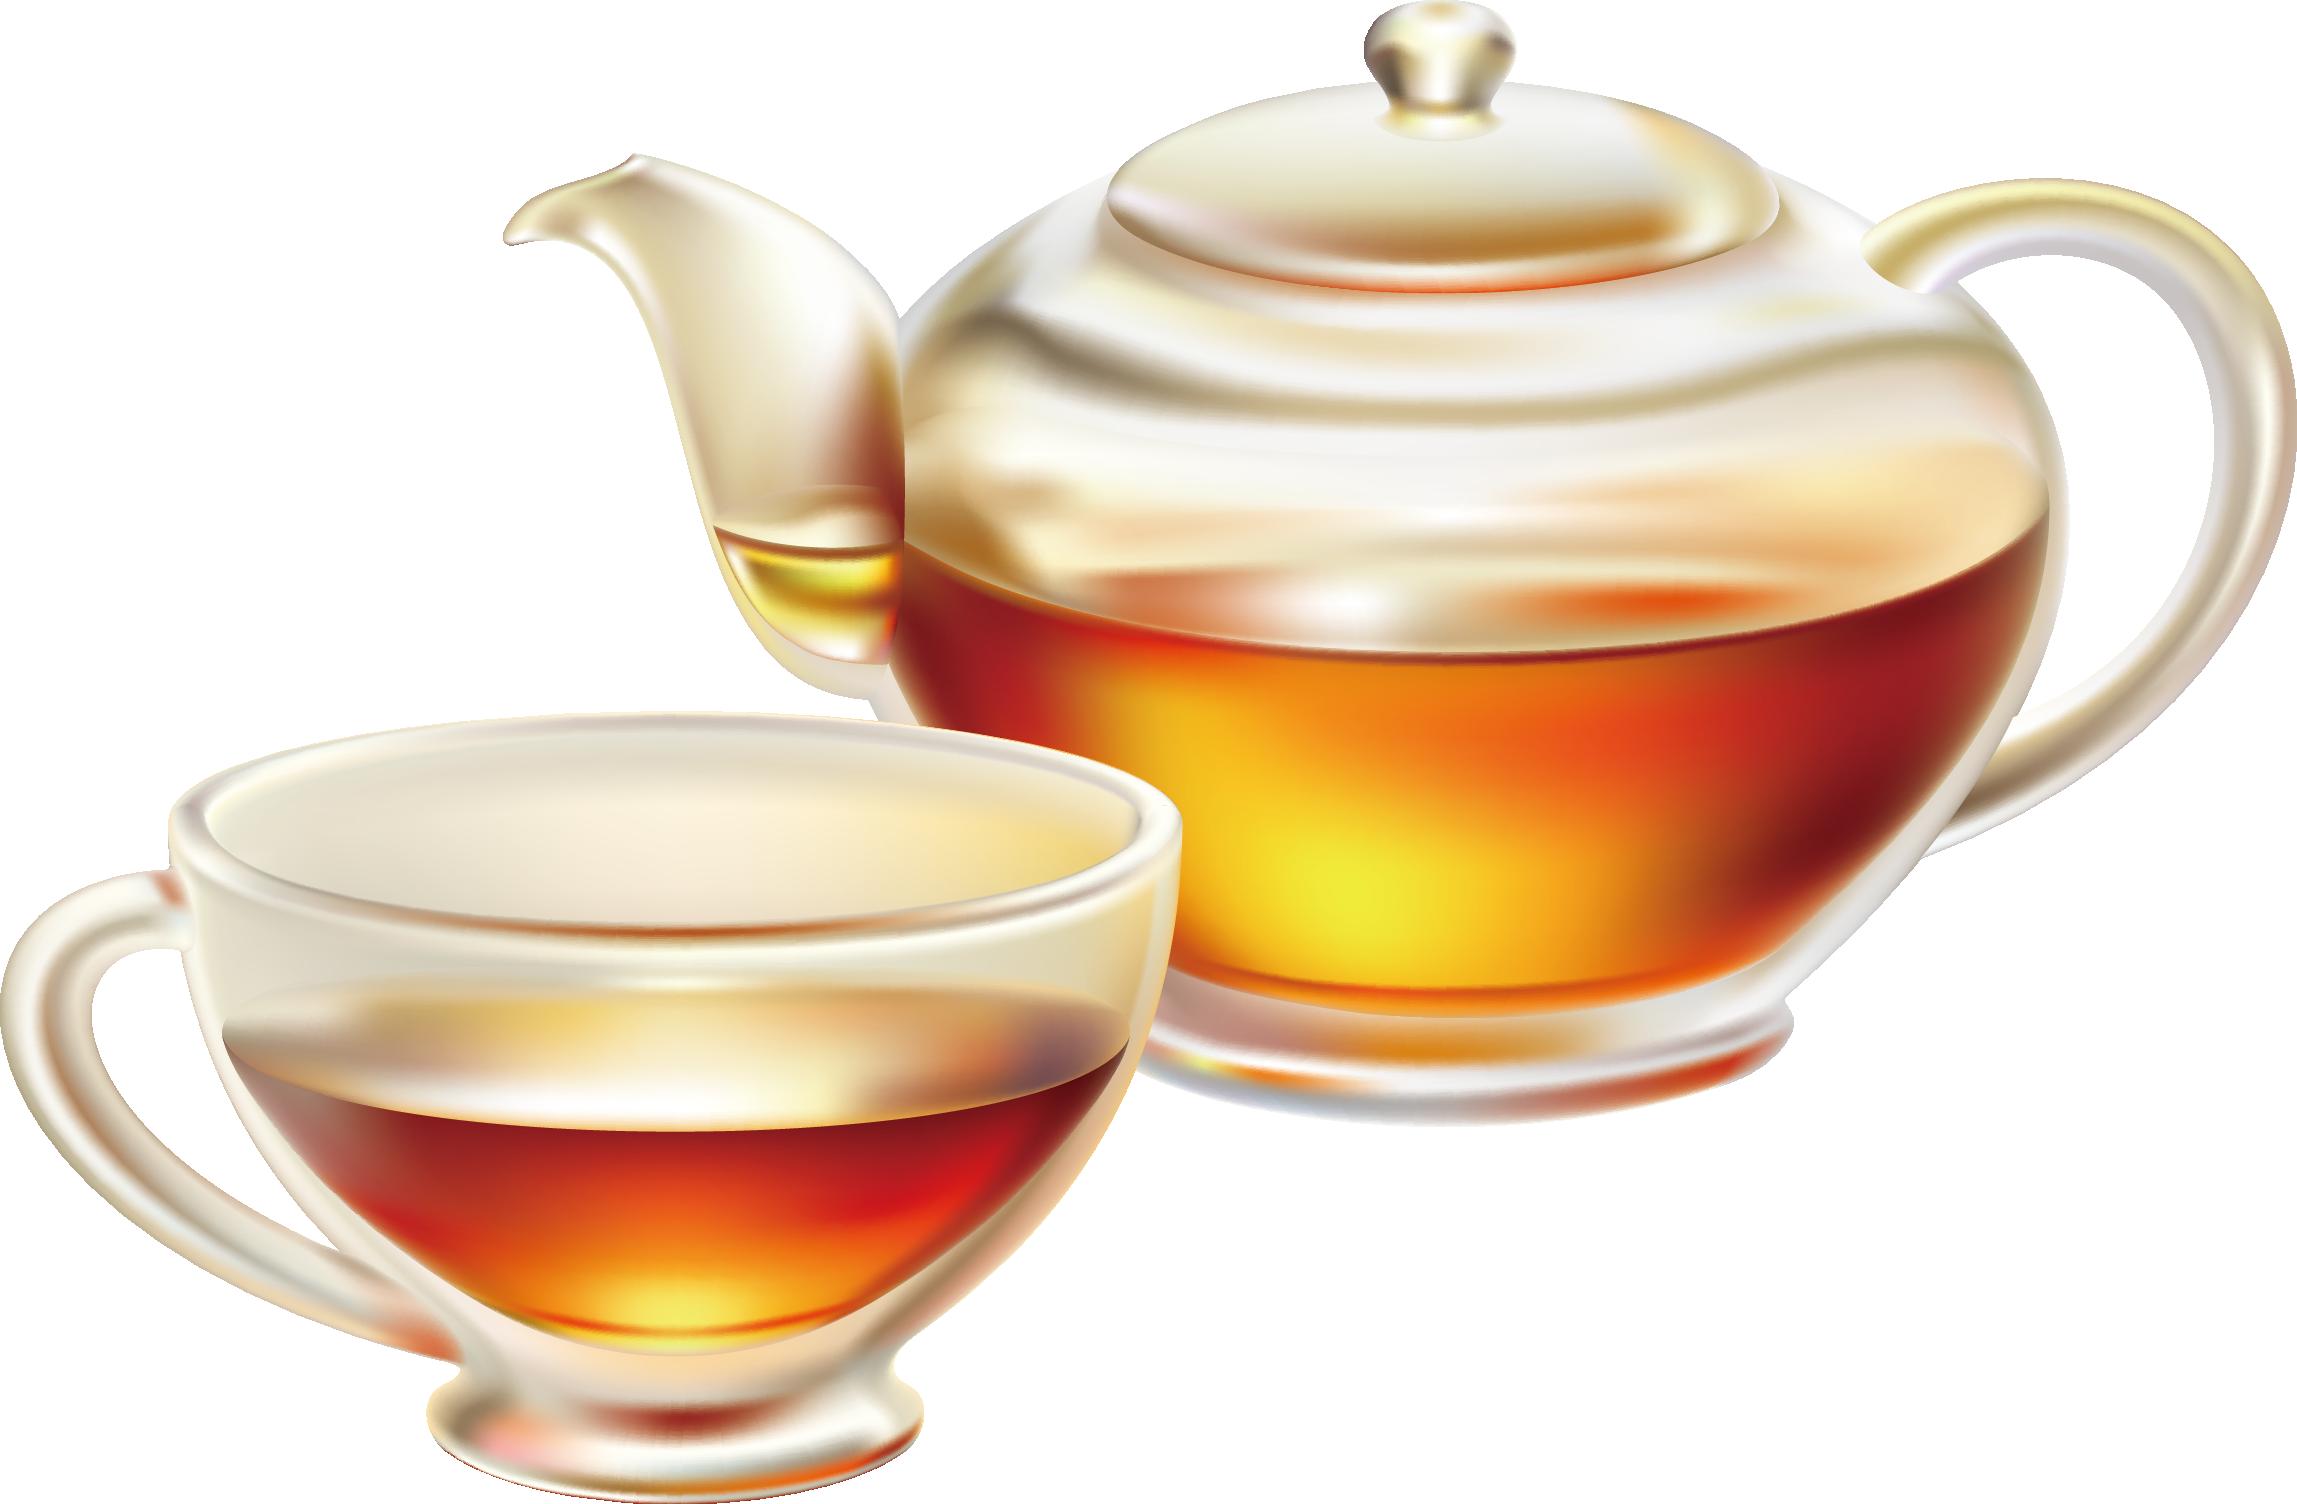 Teacup clip art tea. Orange clipart teapot